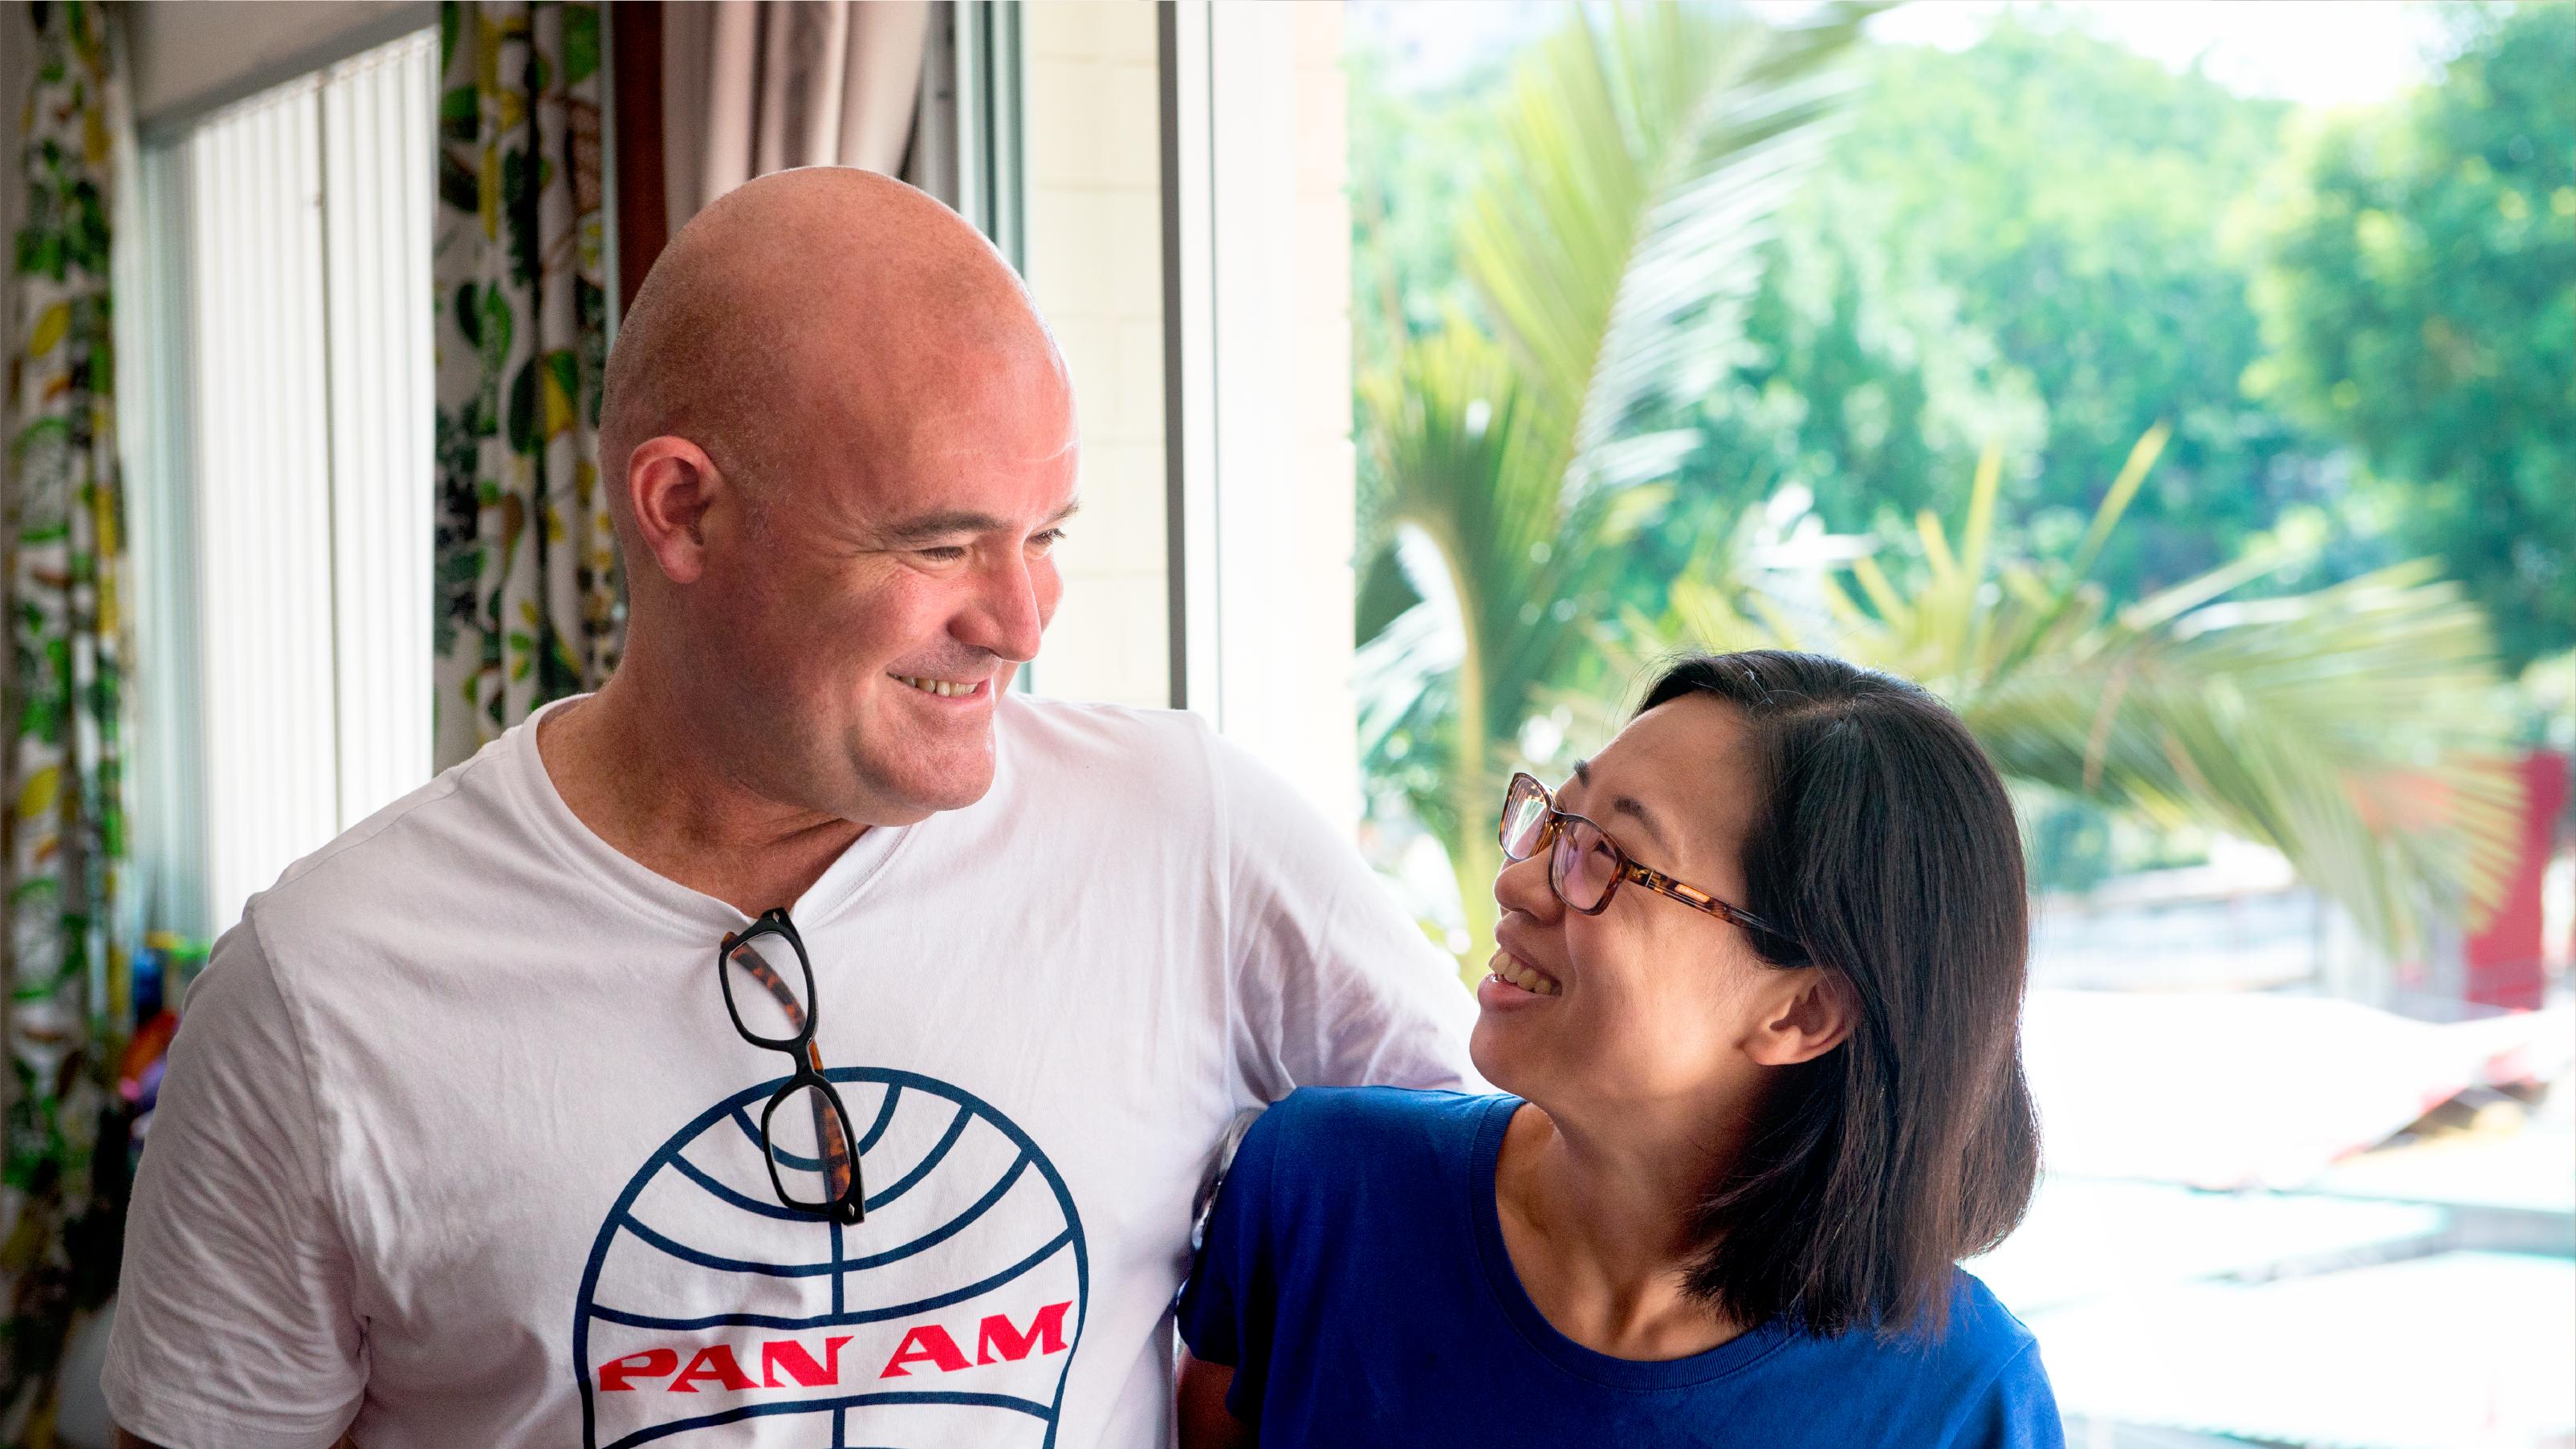 Simon and Ai Ping lives in a 5-room HDB flat in Jalan Bukit Merah